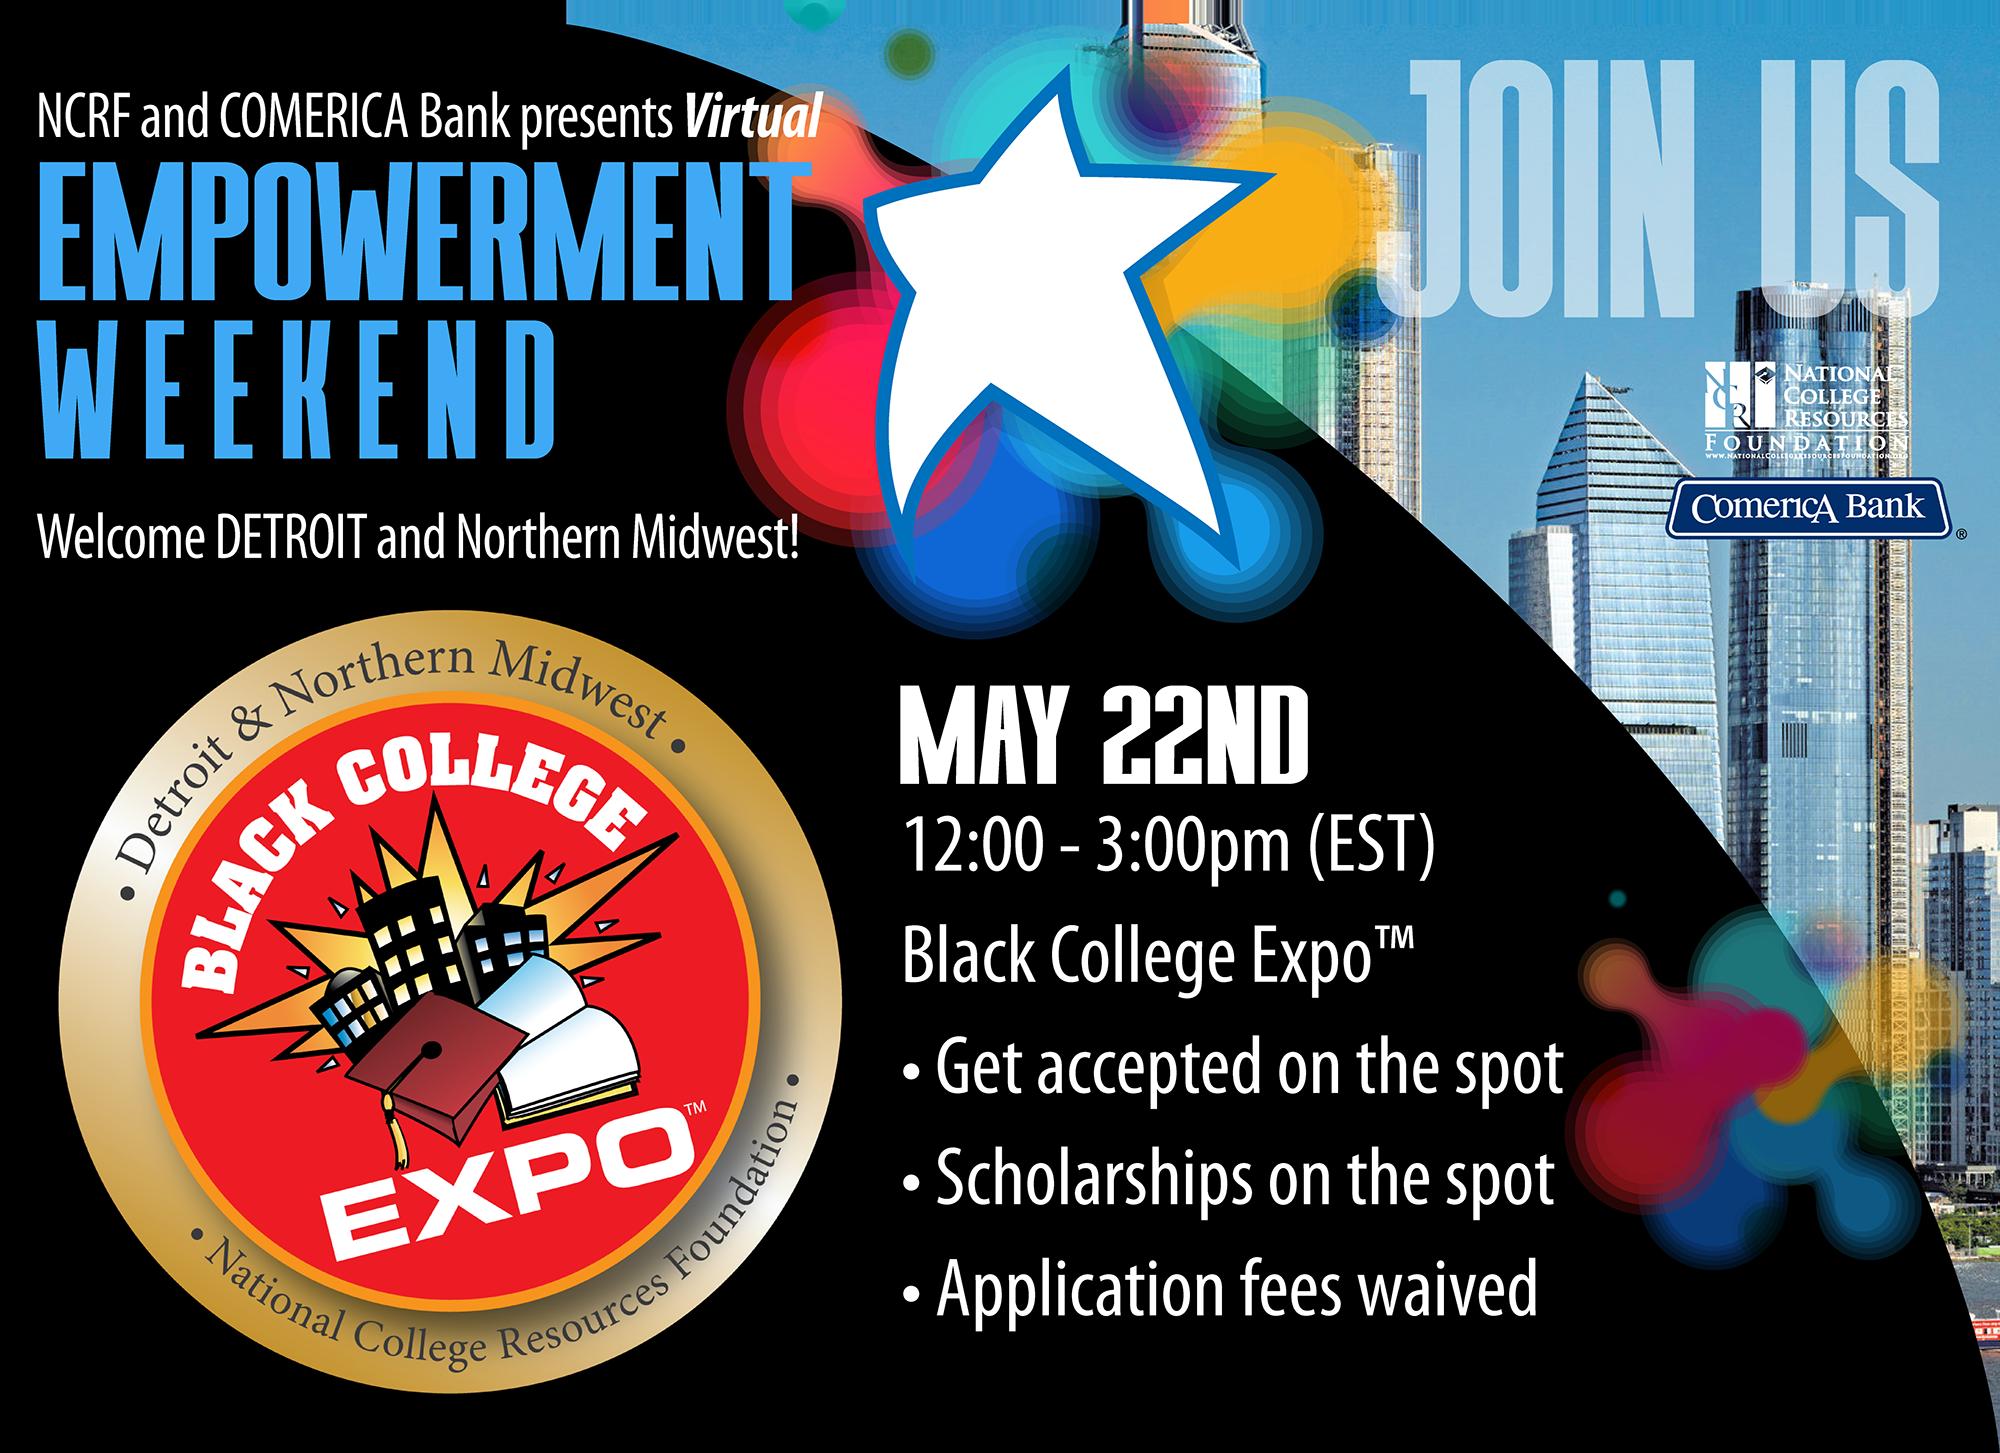 Empowerment Weekend May 22